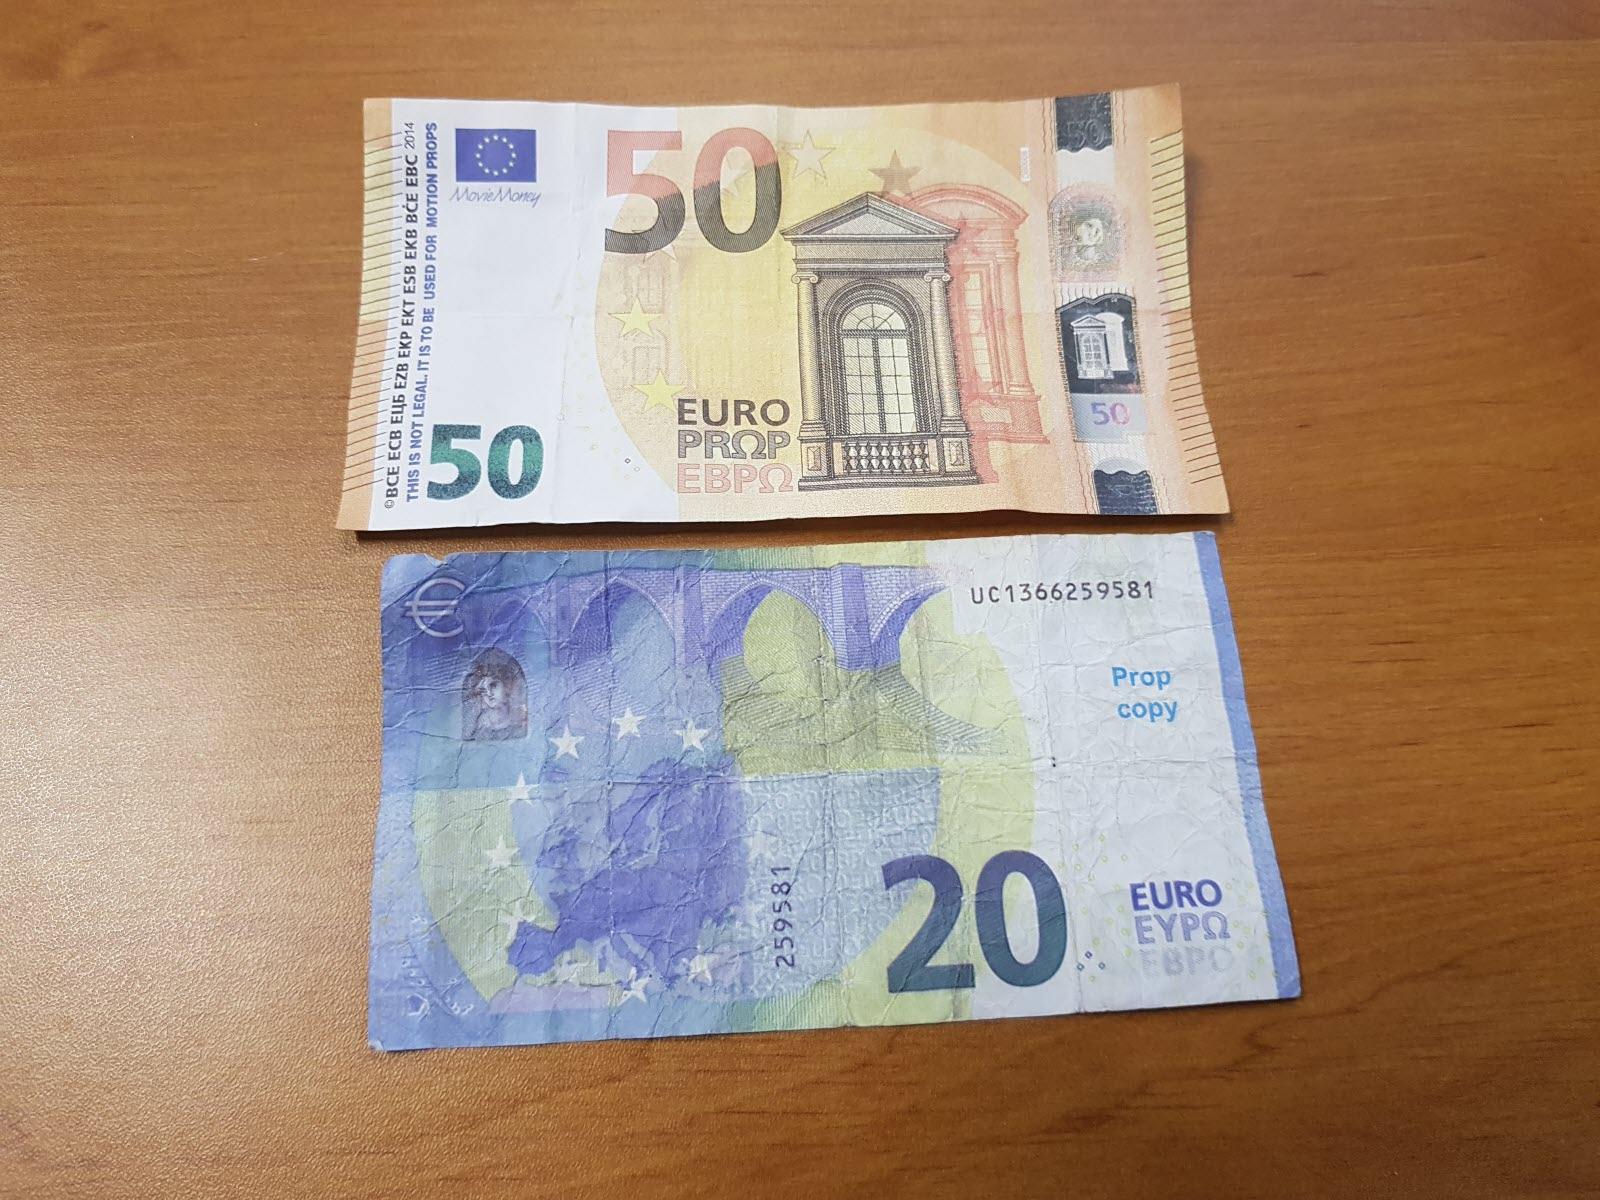 Edition Luneville | Faux Billets En Circulation : La Police concernant Billet Euro A Imprimer